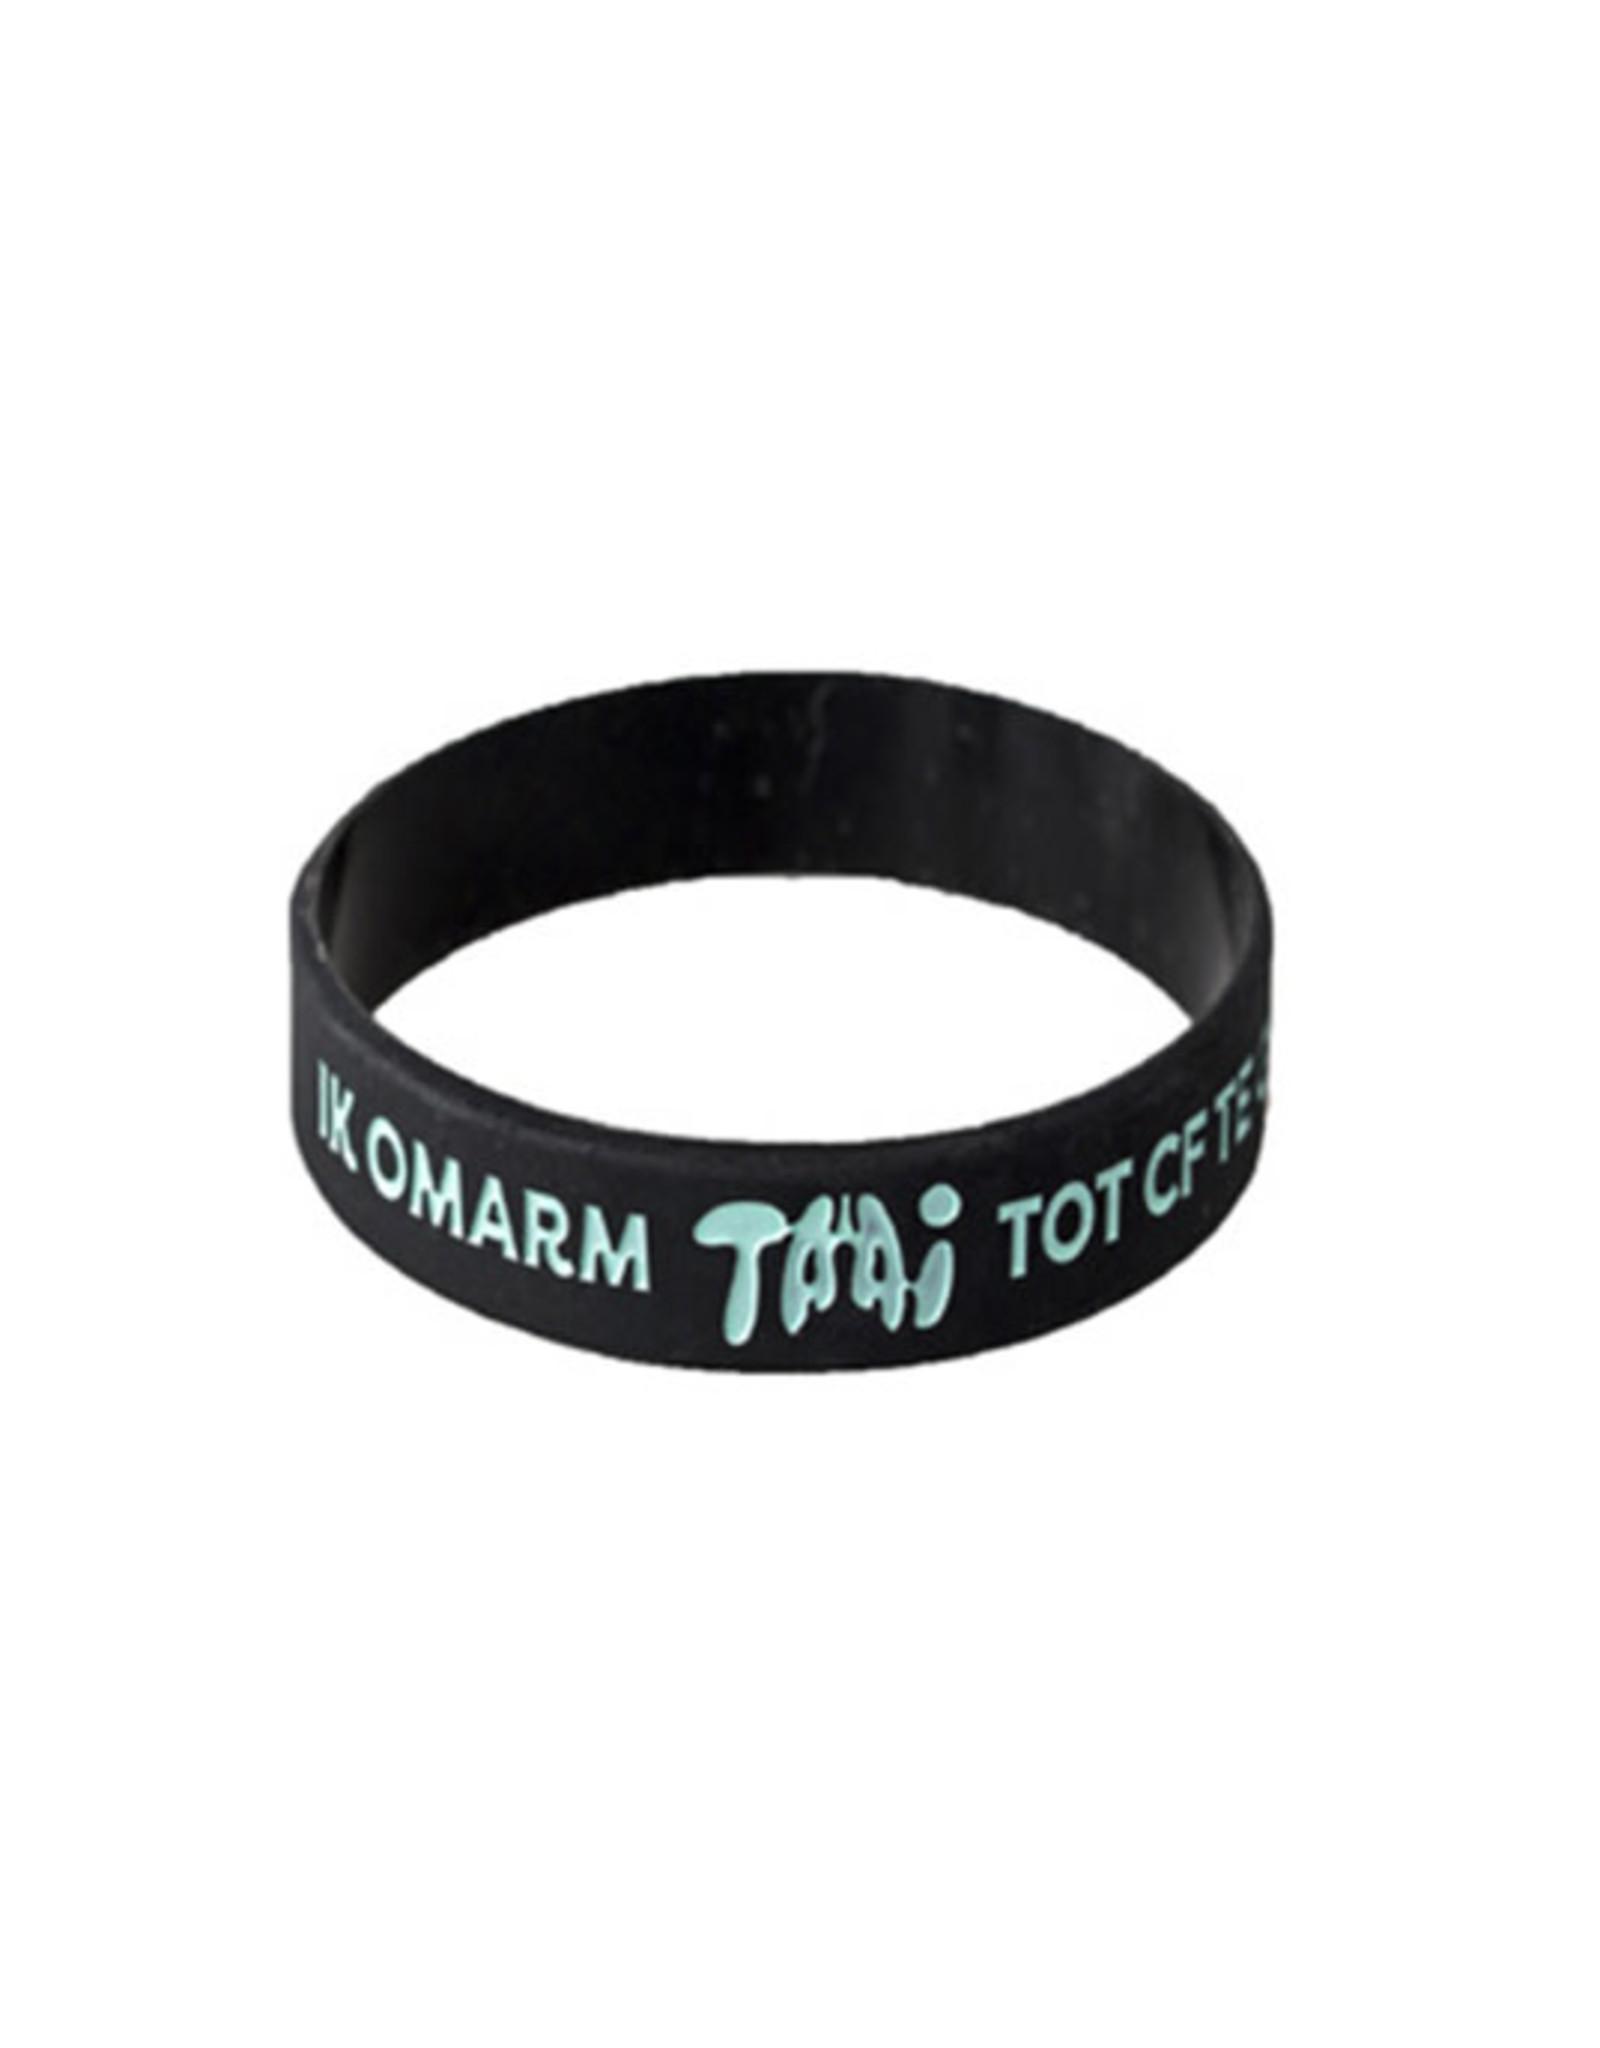 Stichting Taai stichting taai armband